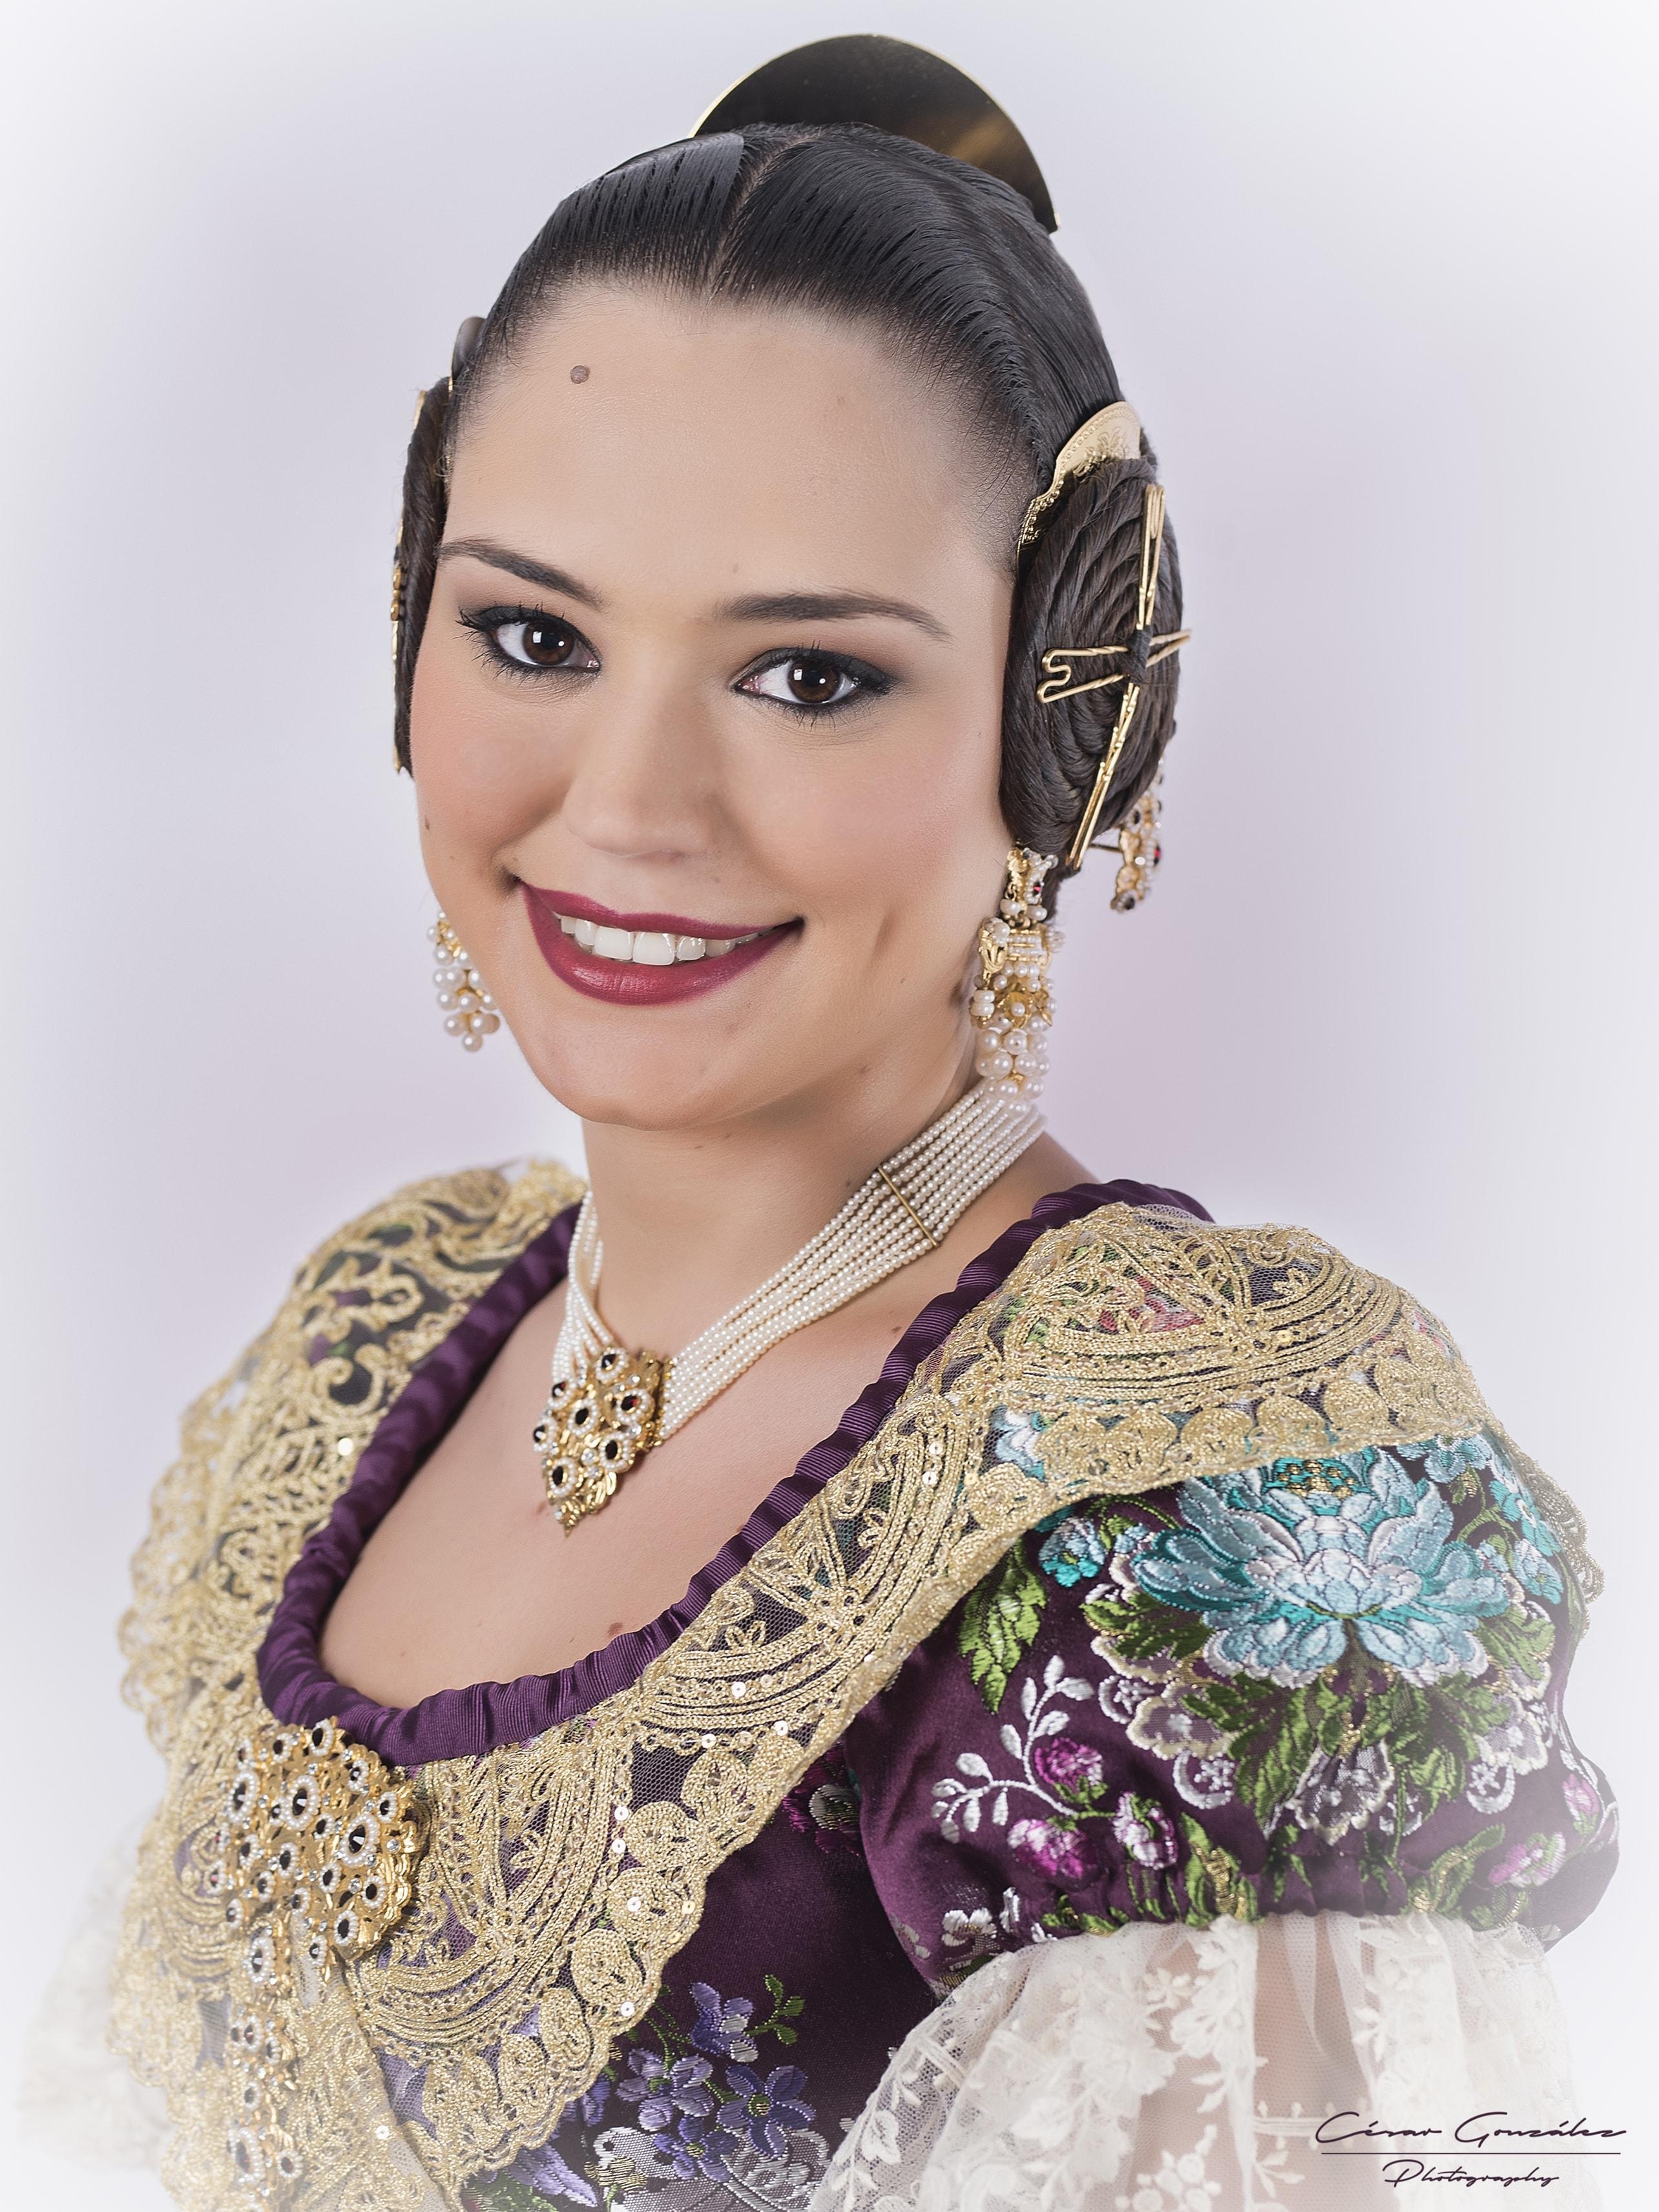 ARANTXA GARCIA LOPEZ - Fallera Mayor 2018